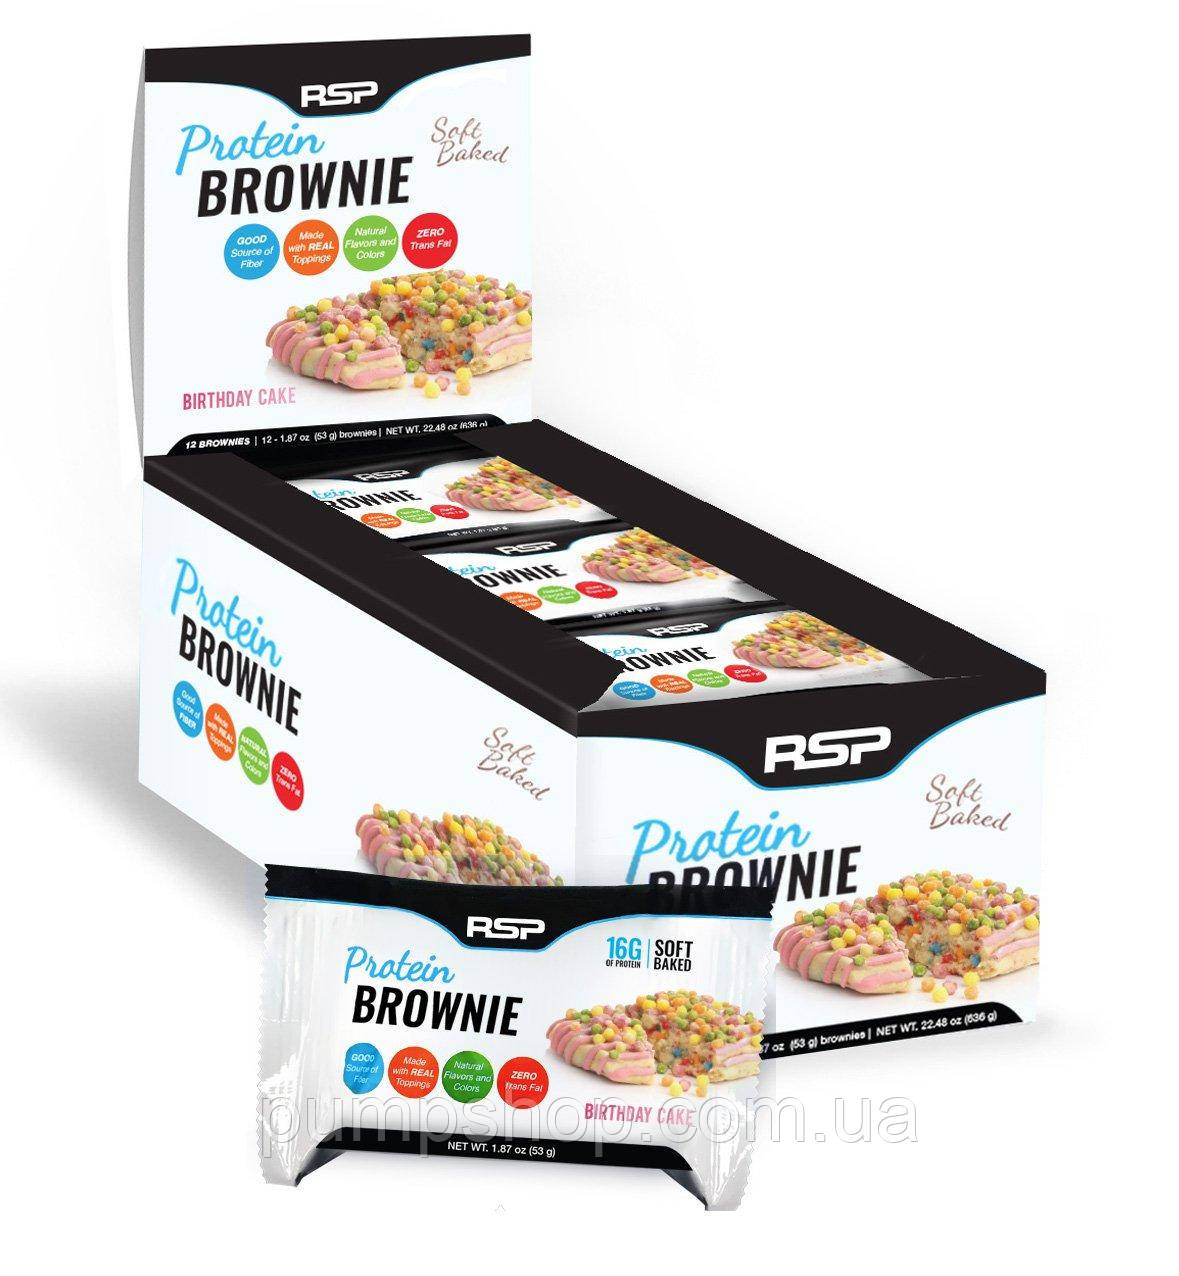 Протеиновый батончик RSP Nutrition Protein Brownie 1 шт. 53 г